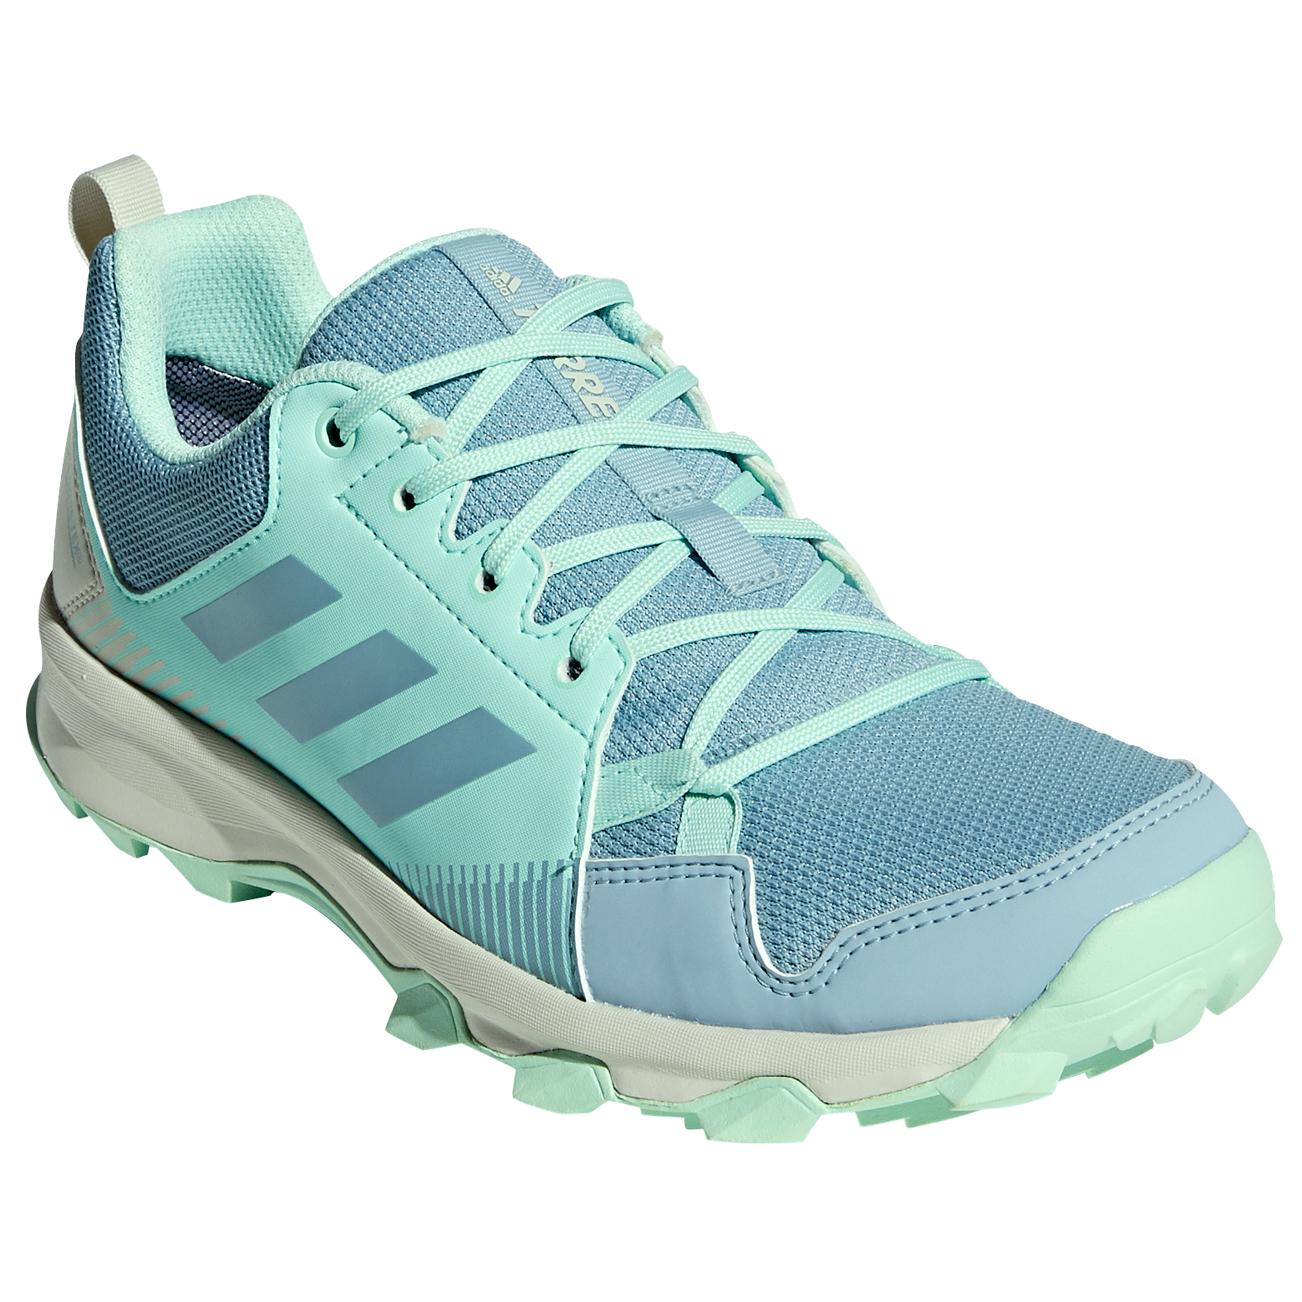 adidas - Women's Terrex Tracerocker GTX - Trail running shoes - Ash Grey /  Ash Grey / Clear Mint | 4 (UK)